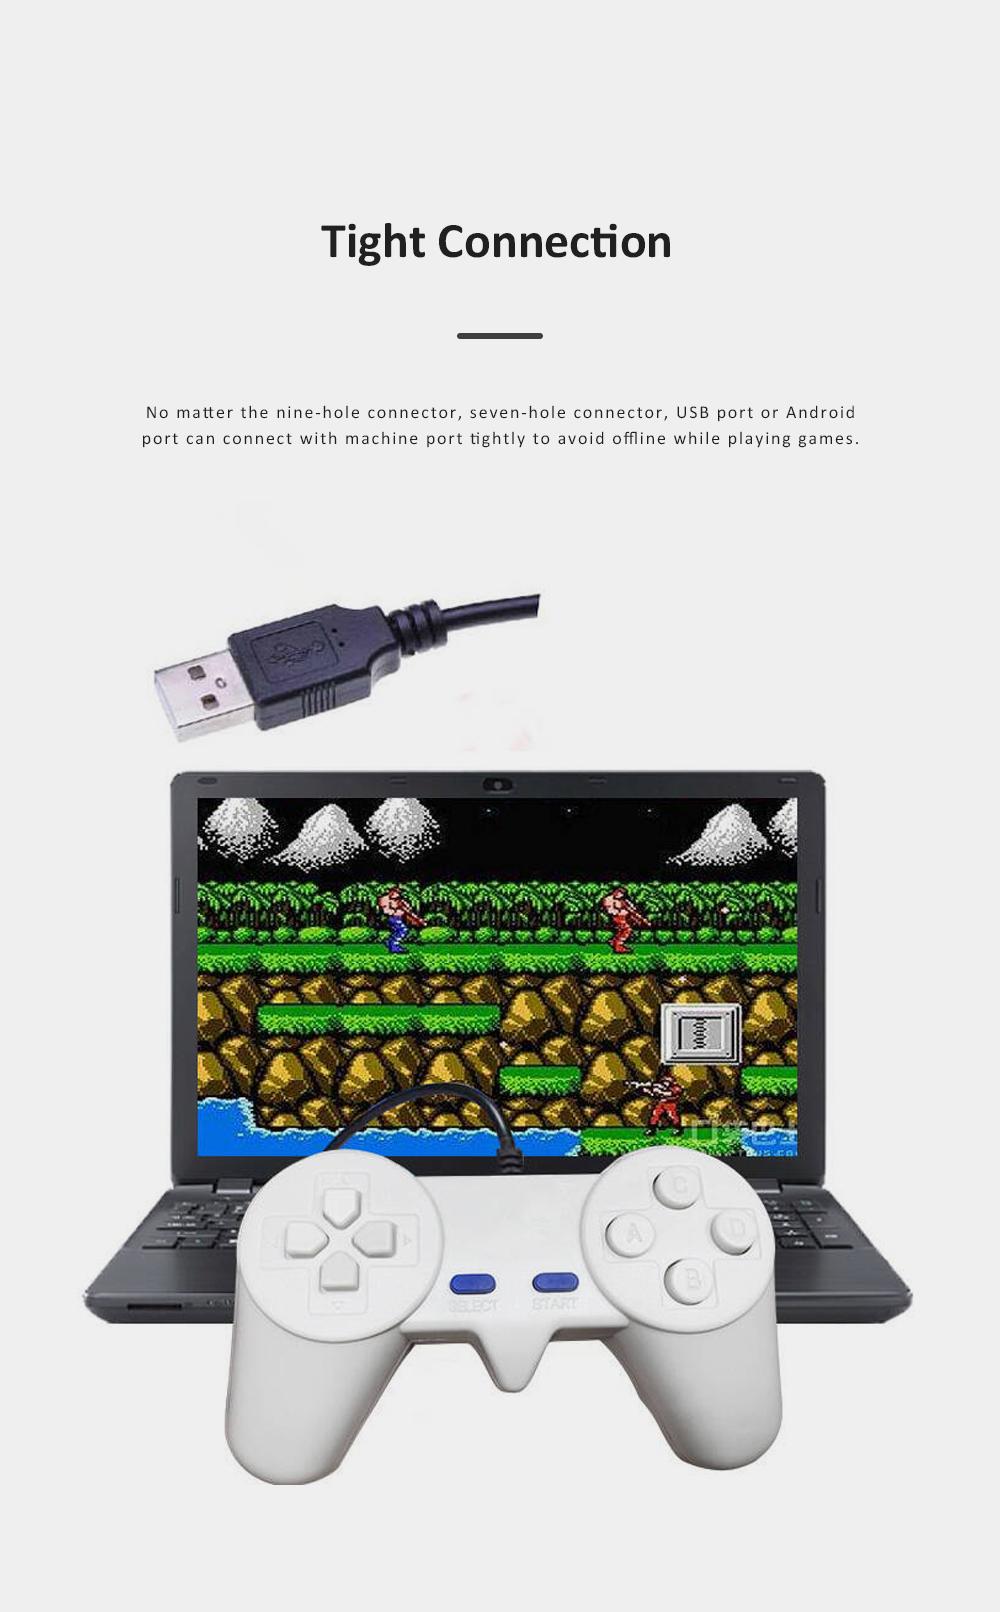 Powkiddy Gamepad Multiple Port Designed Joy Stick Compatible for D101 D99 D68 Game Machines 4